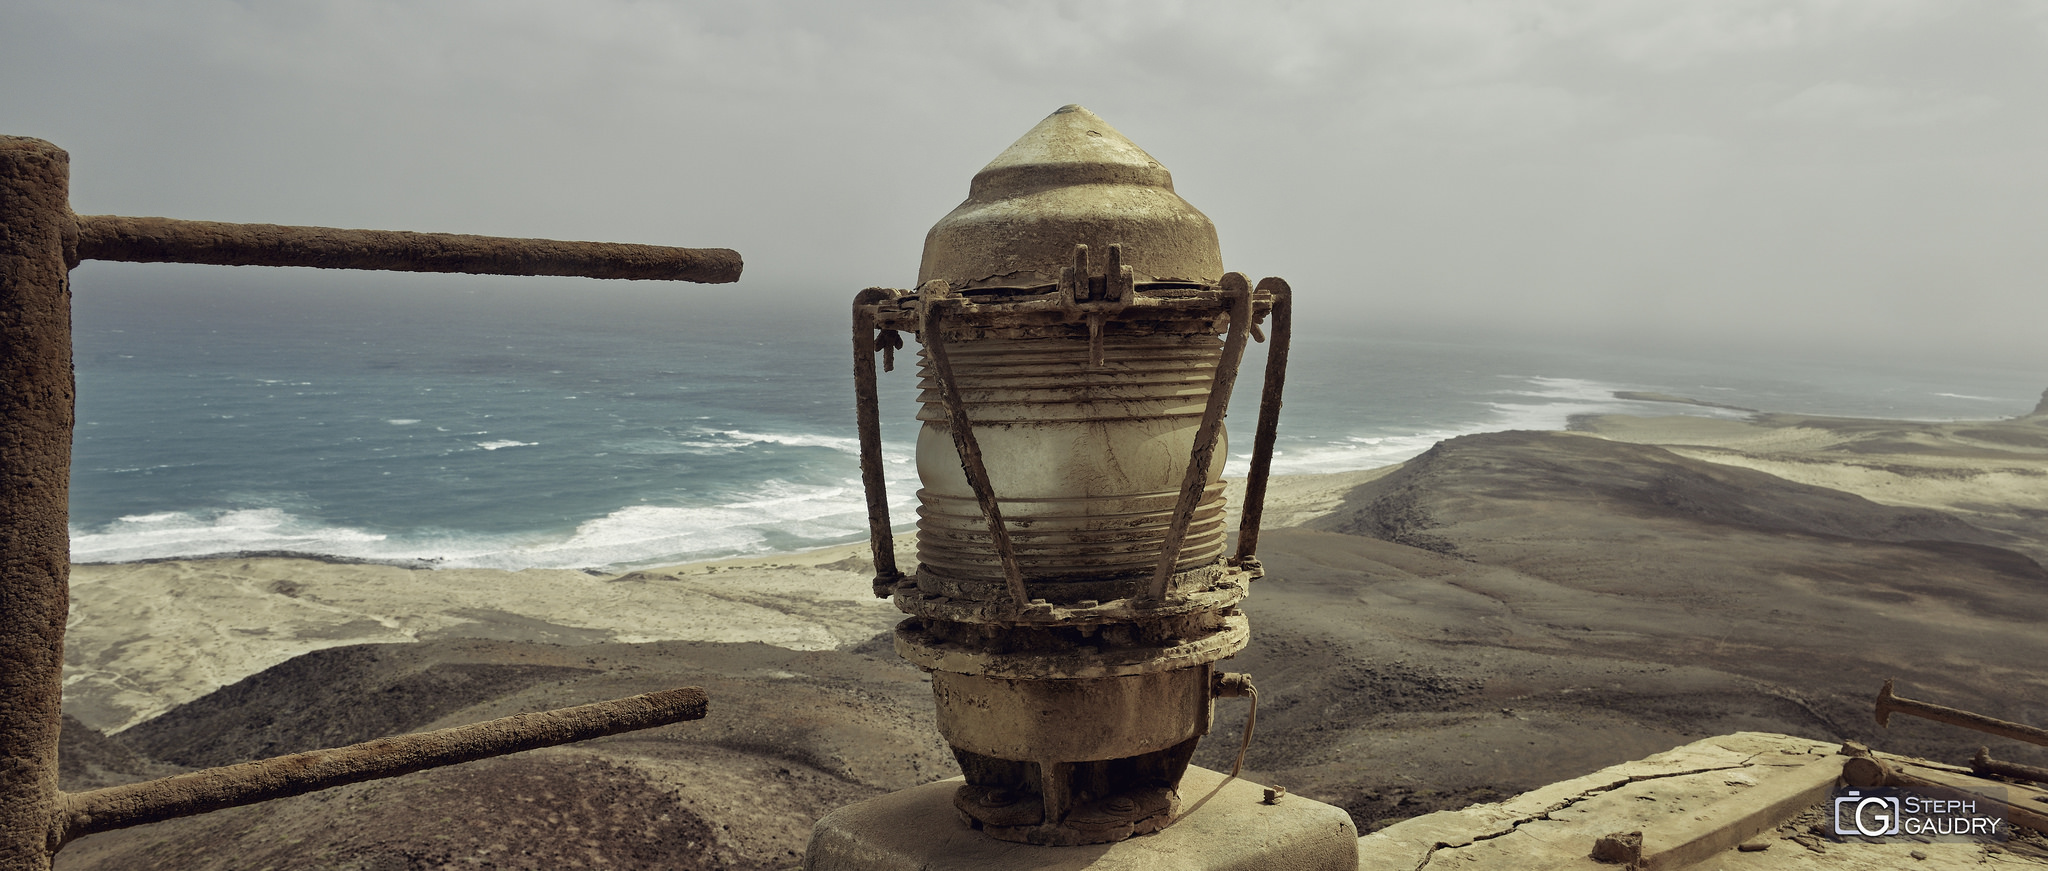 Vue depuis la phare abandonné de Morro Negro [Click to start slideshow]